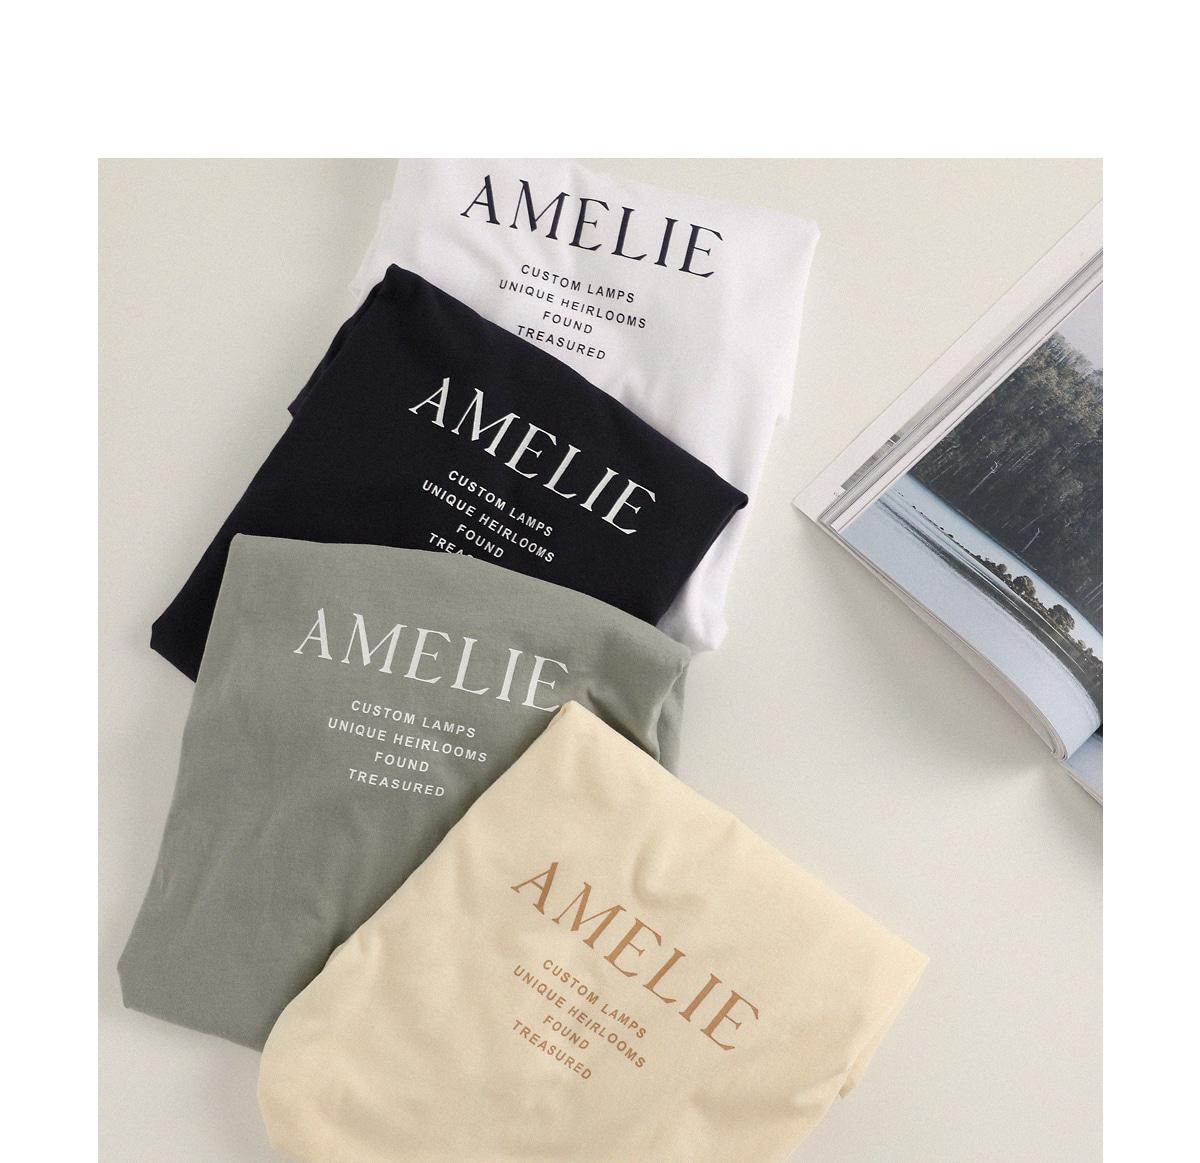 Amel round tee